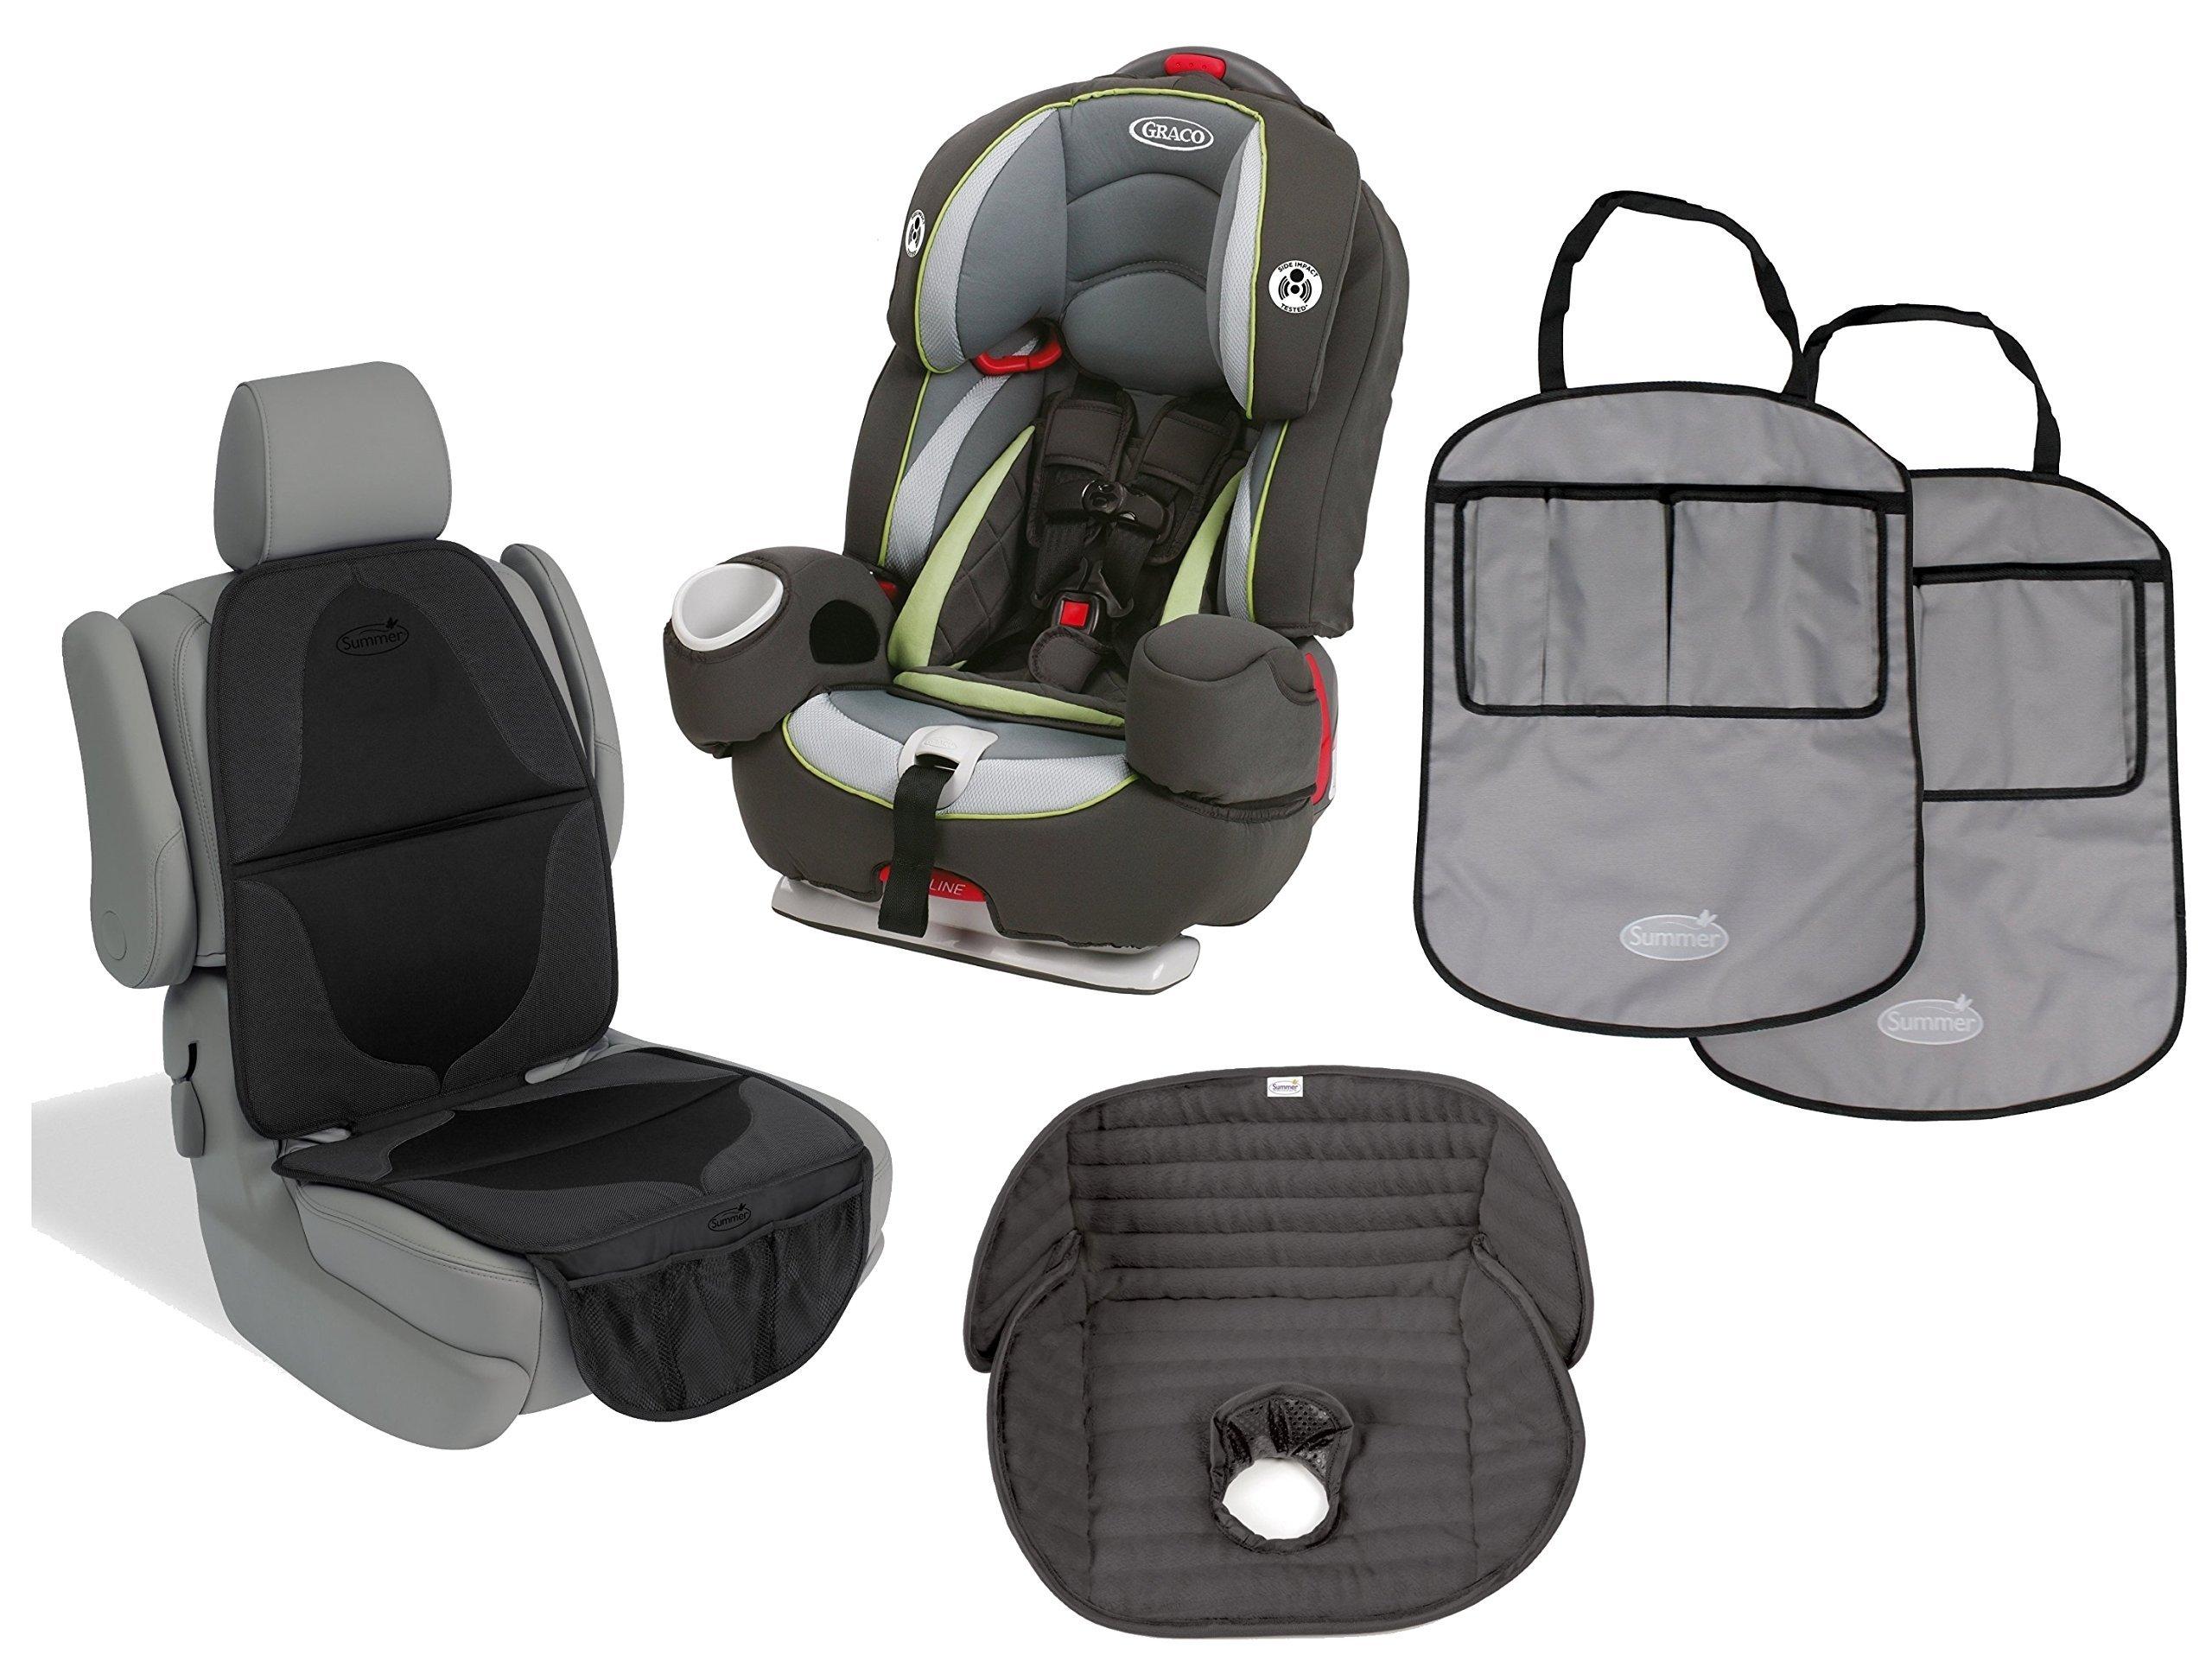 Graco Argos 80 Elite 3 In 1 Car Seat With Mat